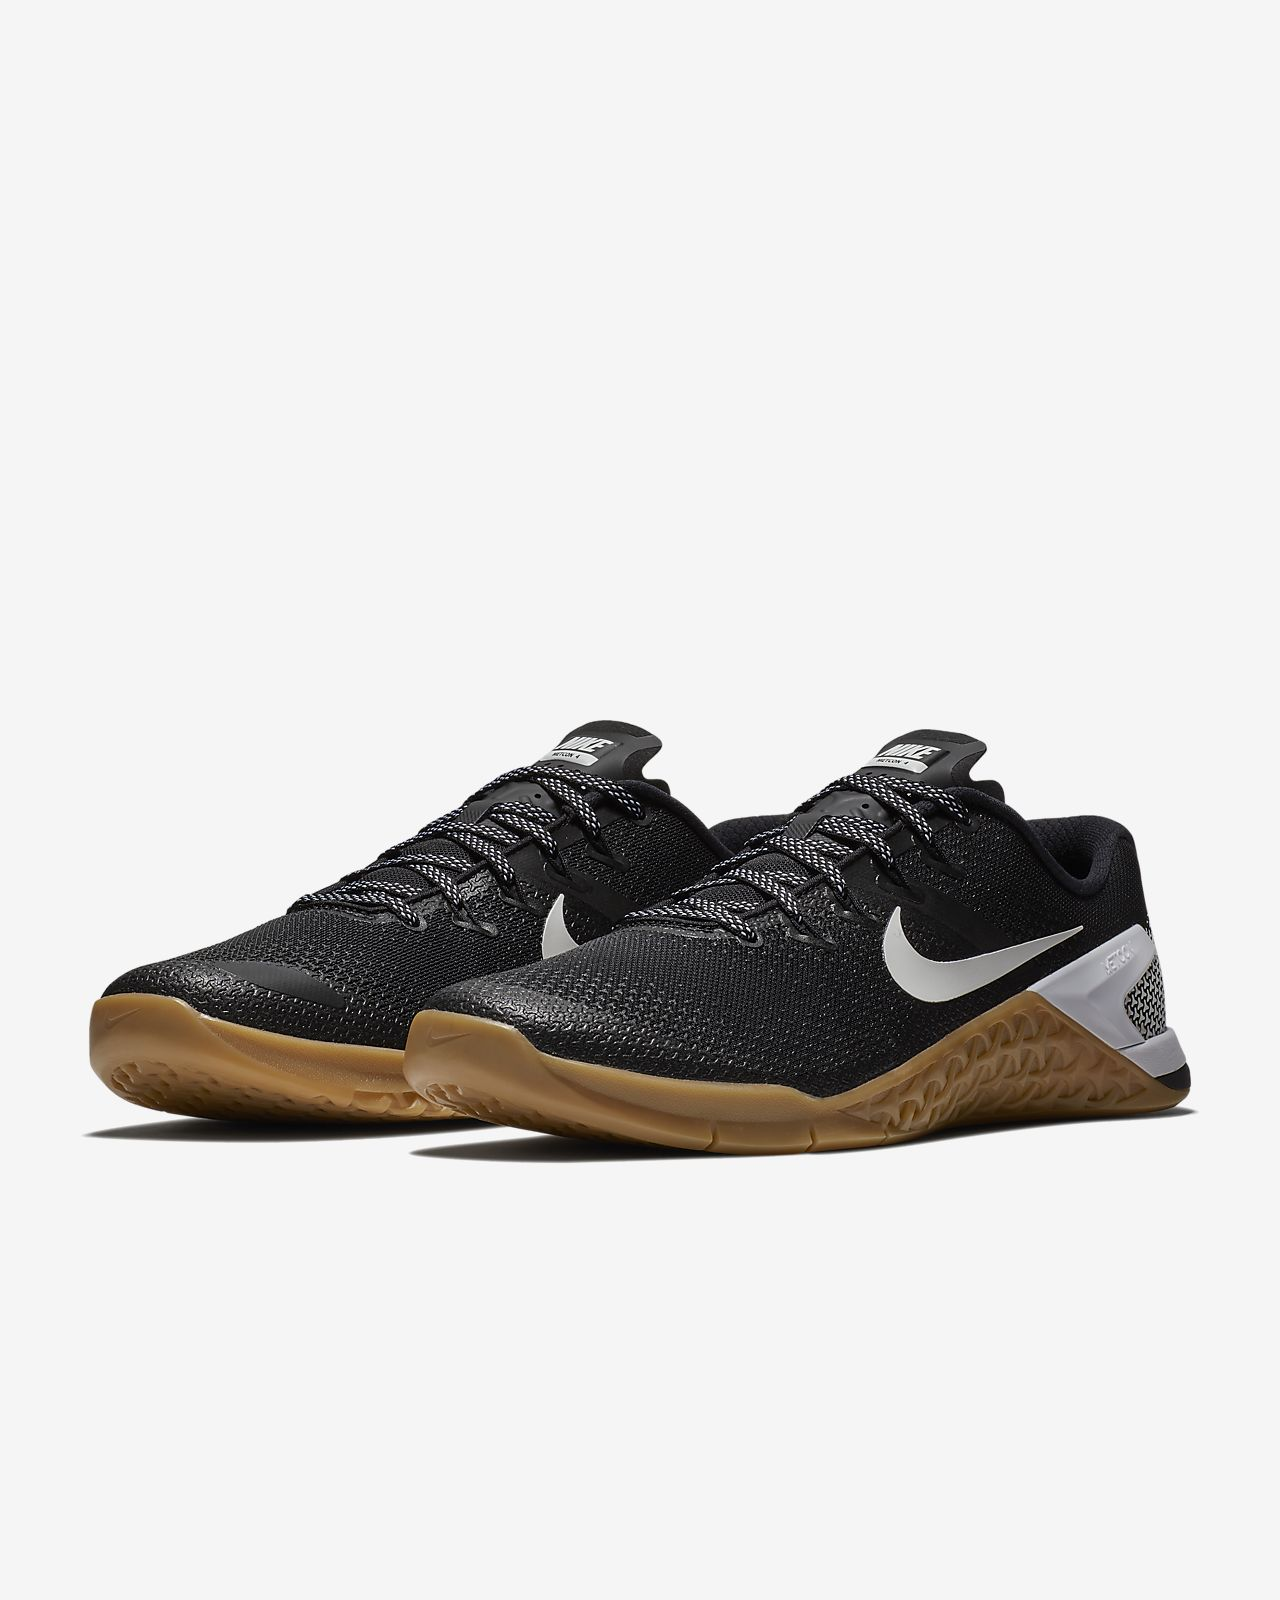 size 40 831f7 6f3a2 ... Nike Metcon 4 Men s Cross Training Weightlifting Shoe